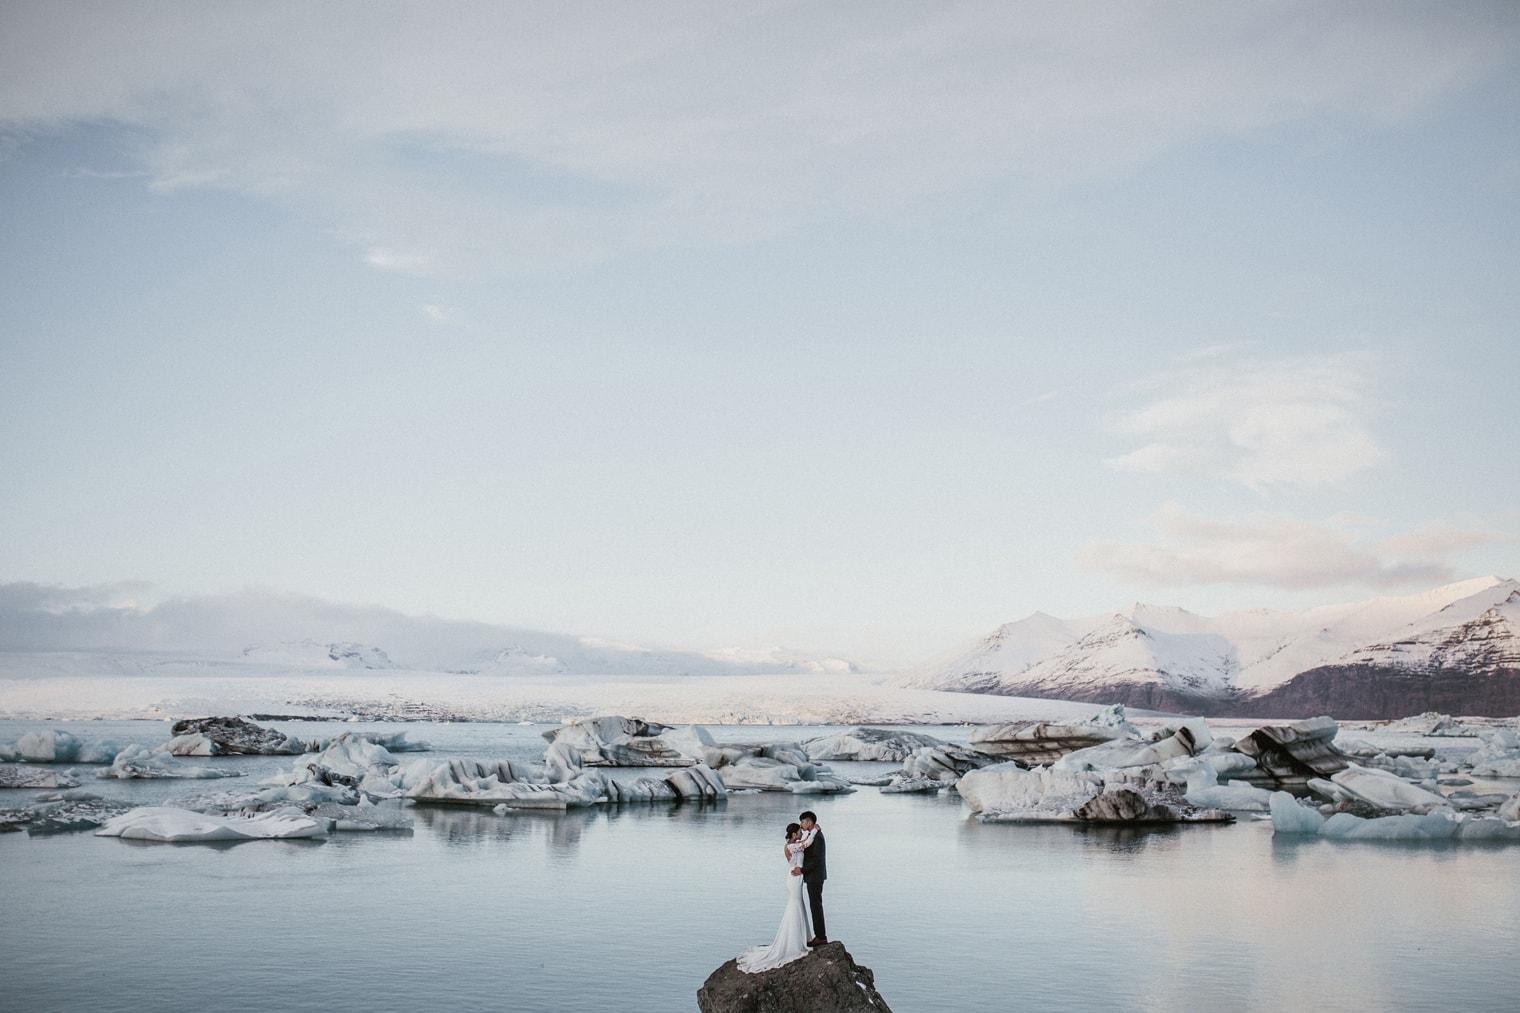 glacier lagoon wedding iceland